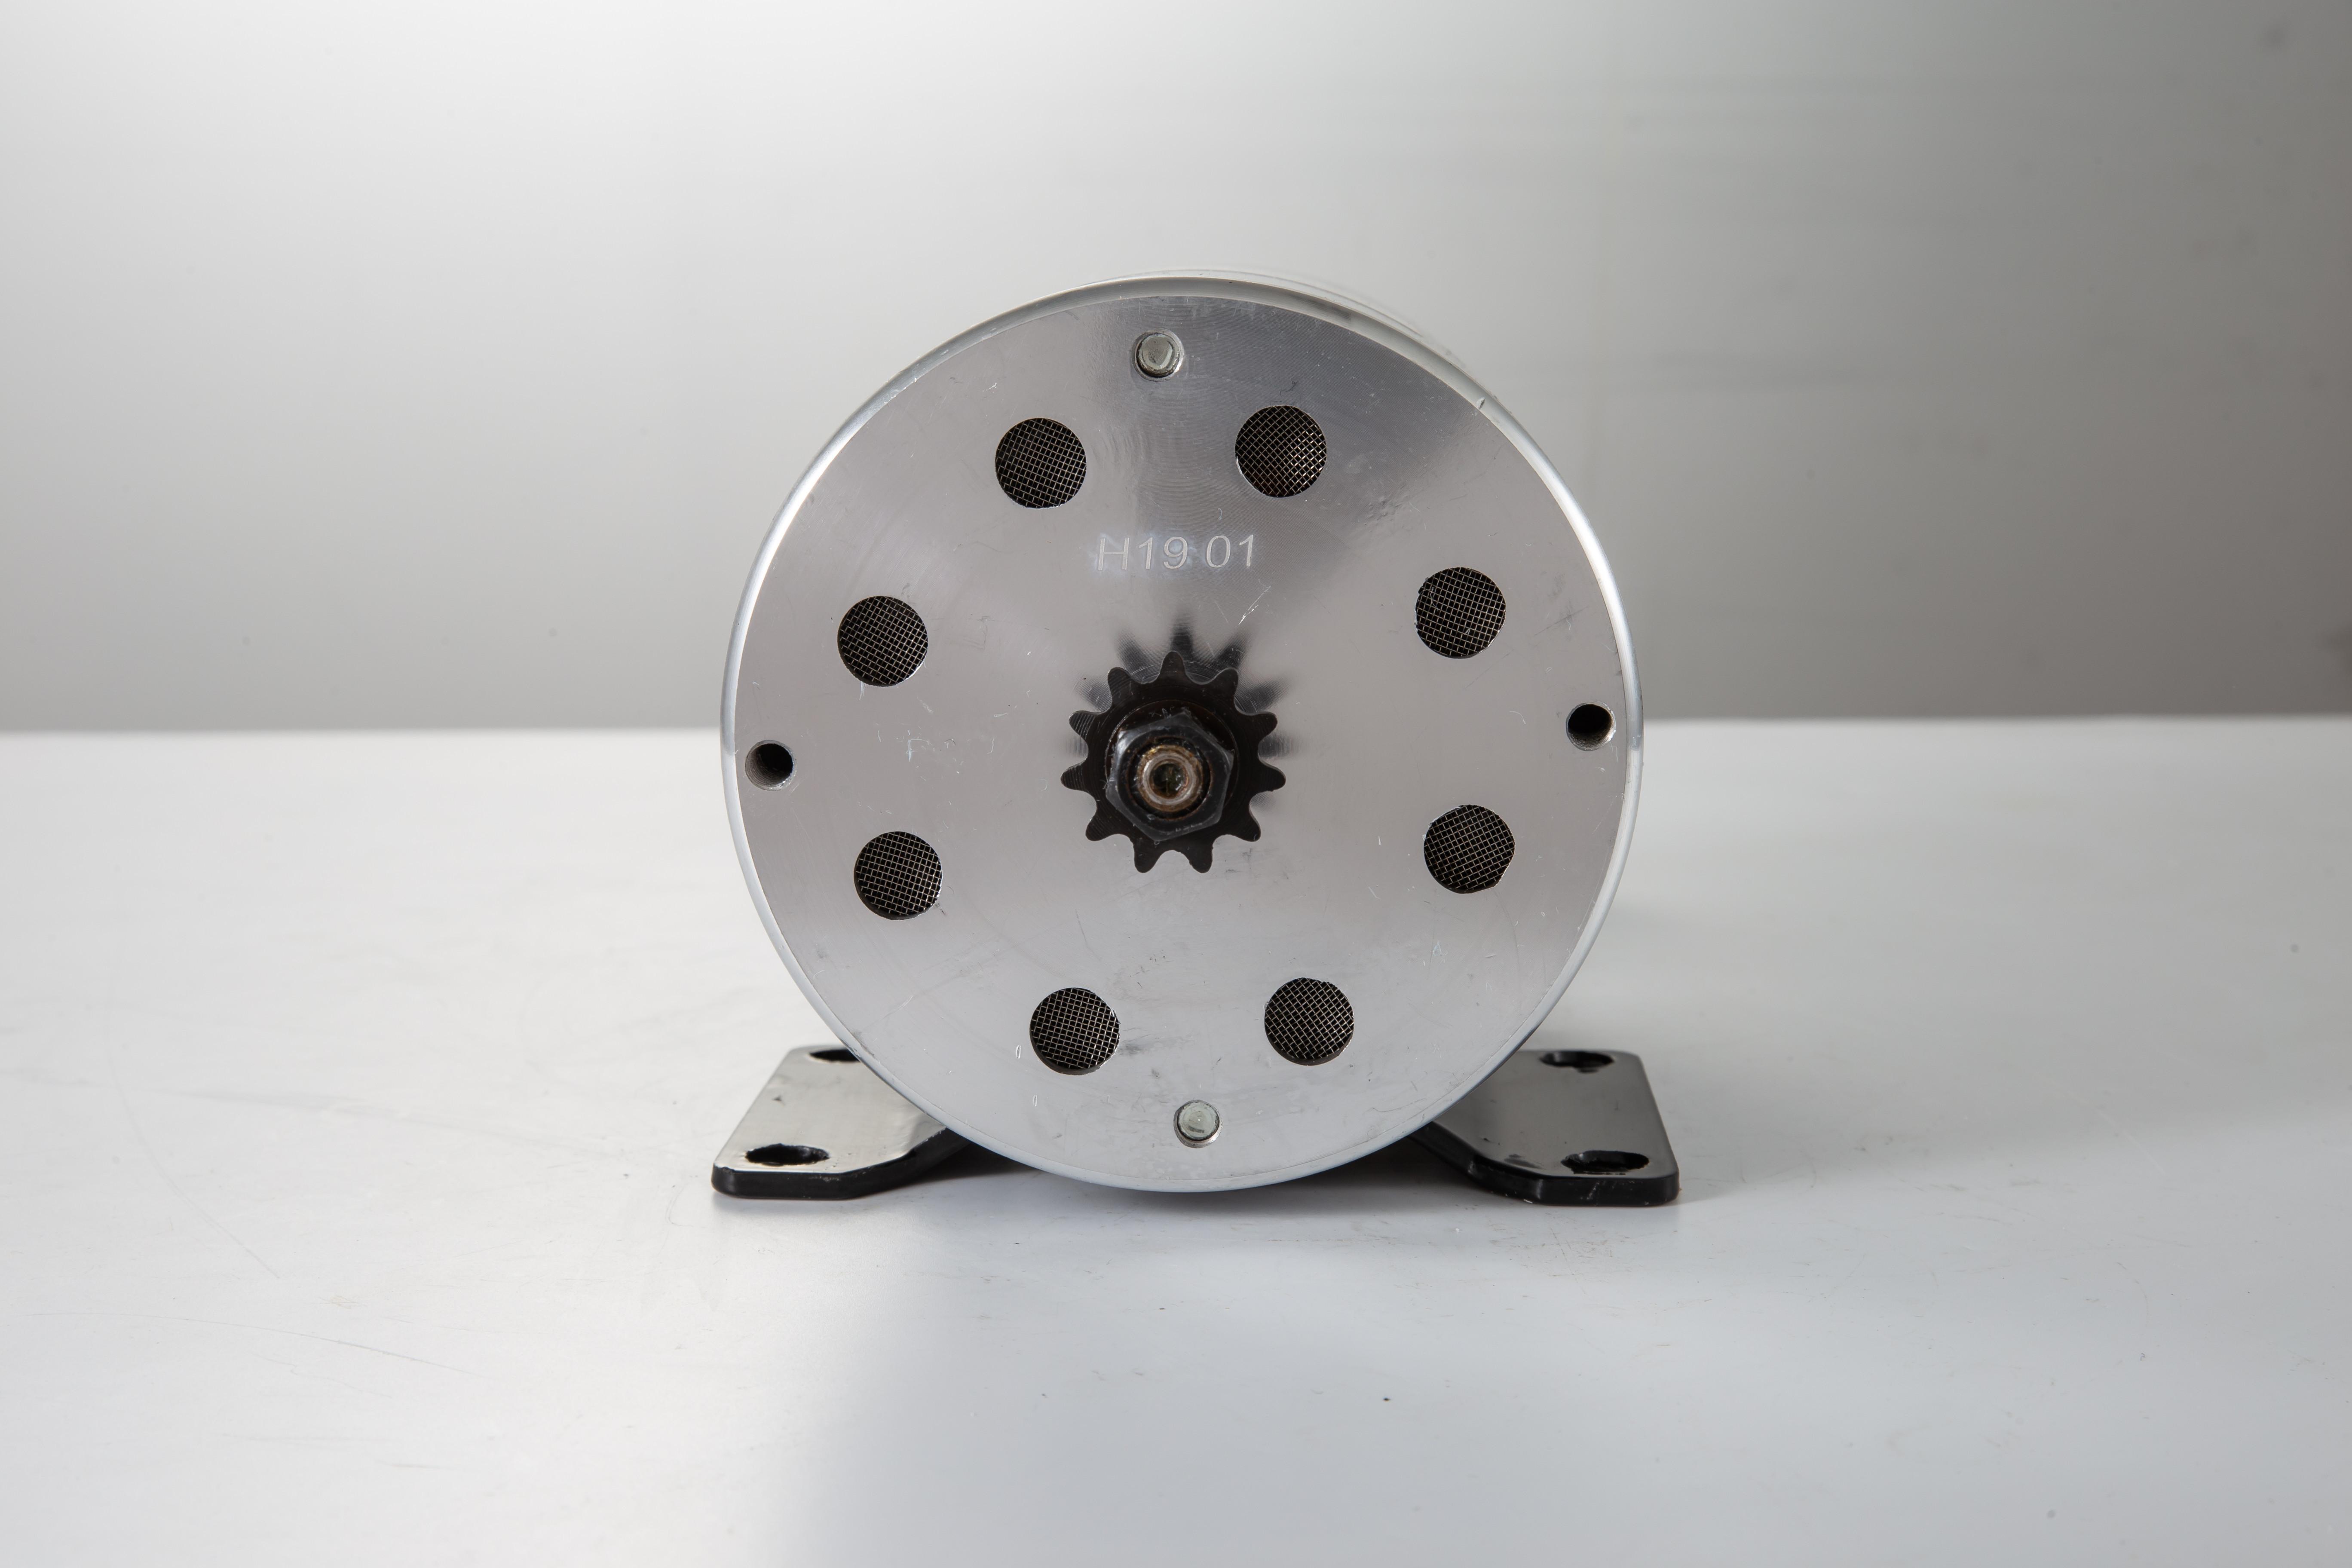 1800W-48V-DC-Brushless-Electric-Motor-Kit-f-Scooter-500-1800W-E-Bike-Go-Kart thumbnail 104